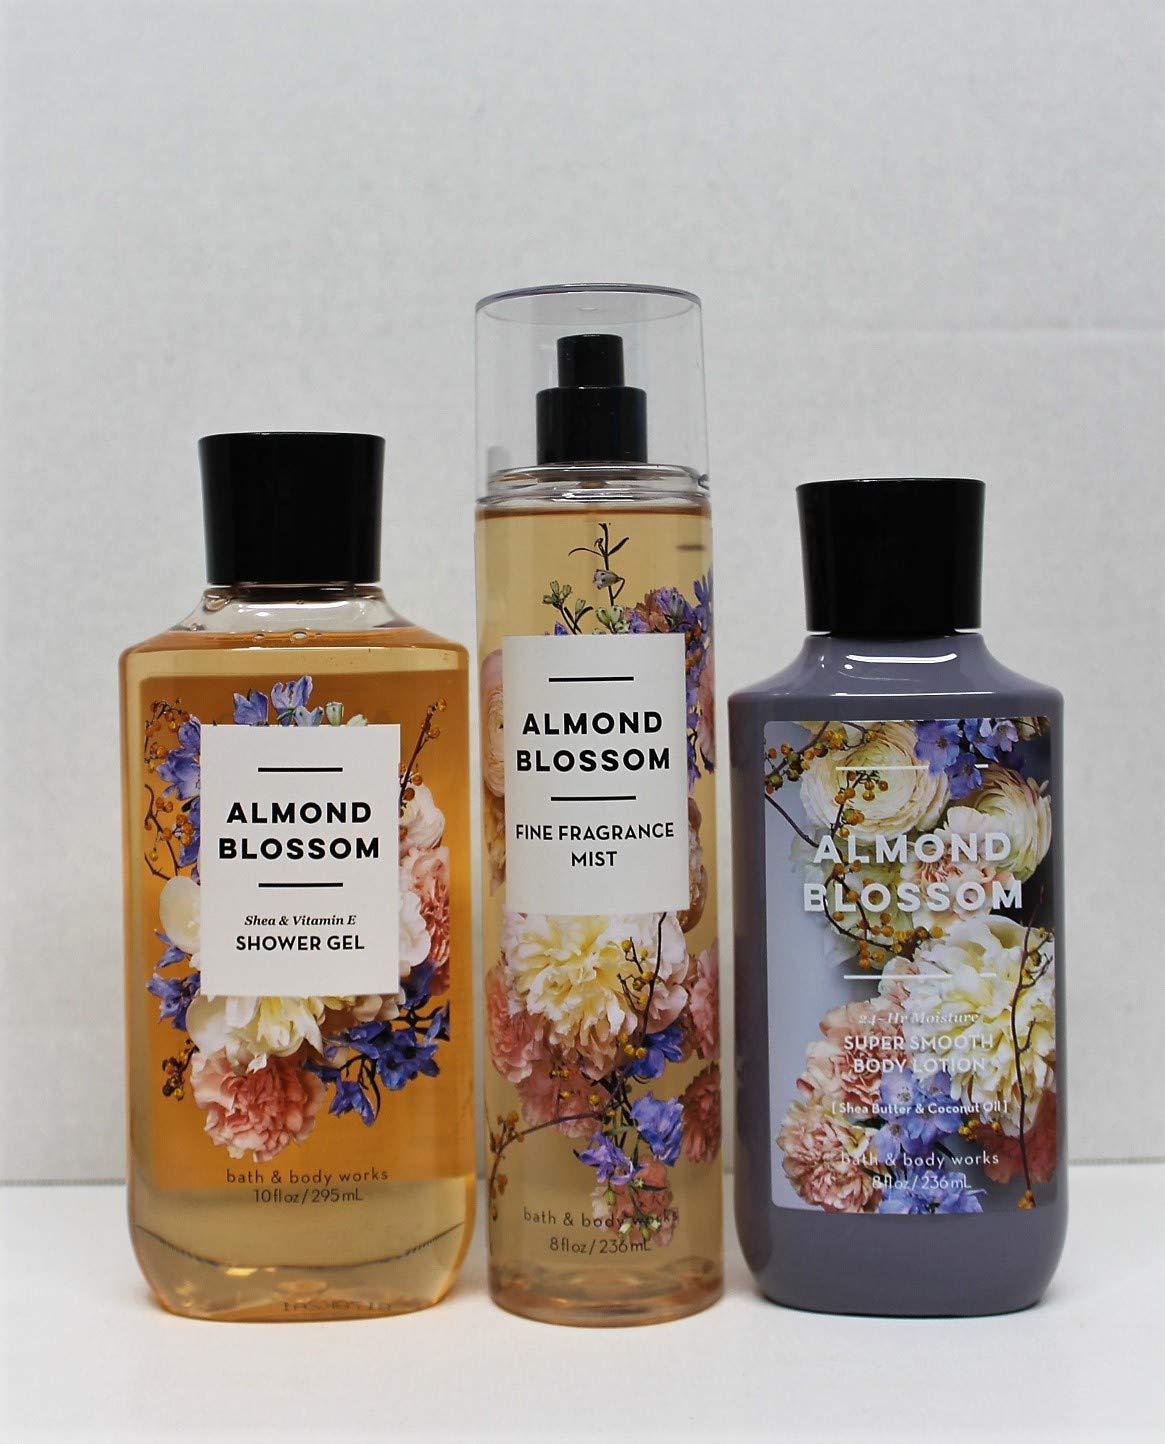 Bath and Body Works - Almond Blossom - Shower Gel, Body Lotion, Fine Fragrance Mist Daily Trio Summer 2018